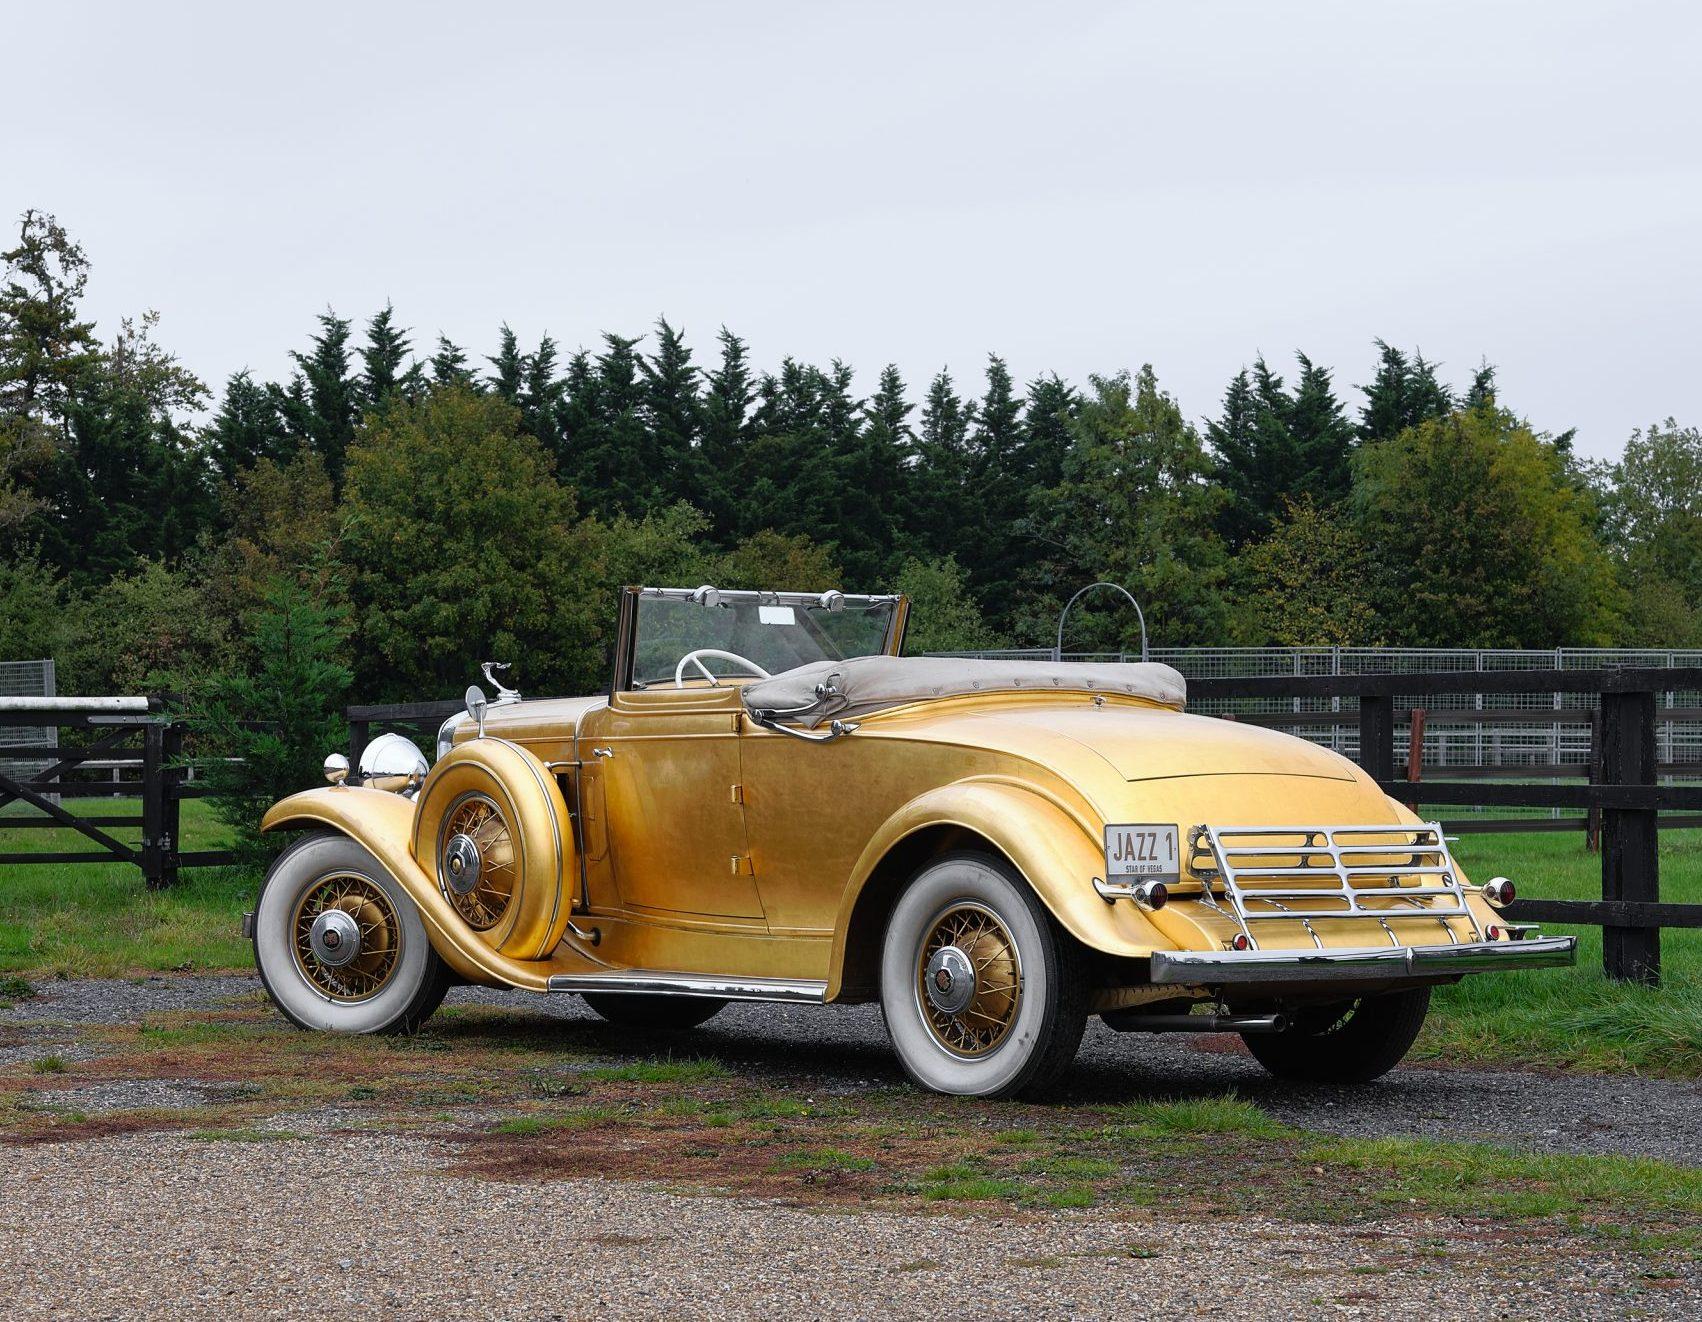 1931 Cadillac V-8 Convertible Coupe rear three-quarter